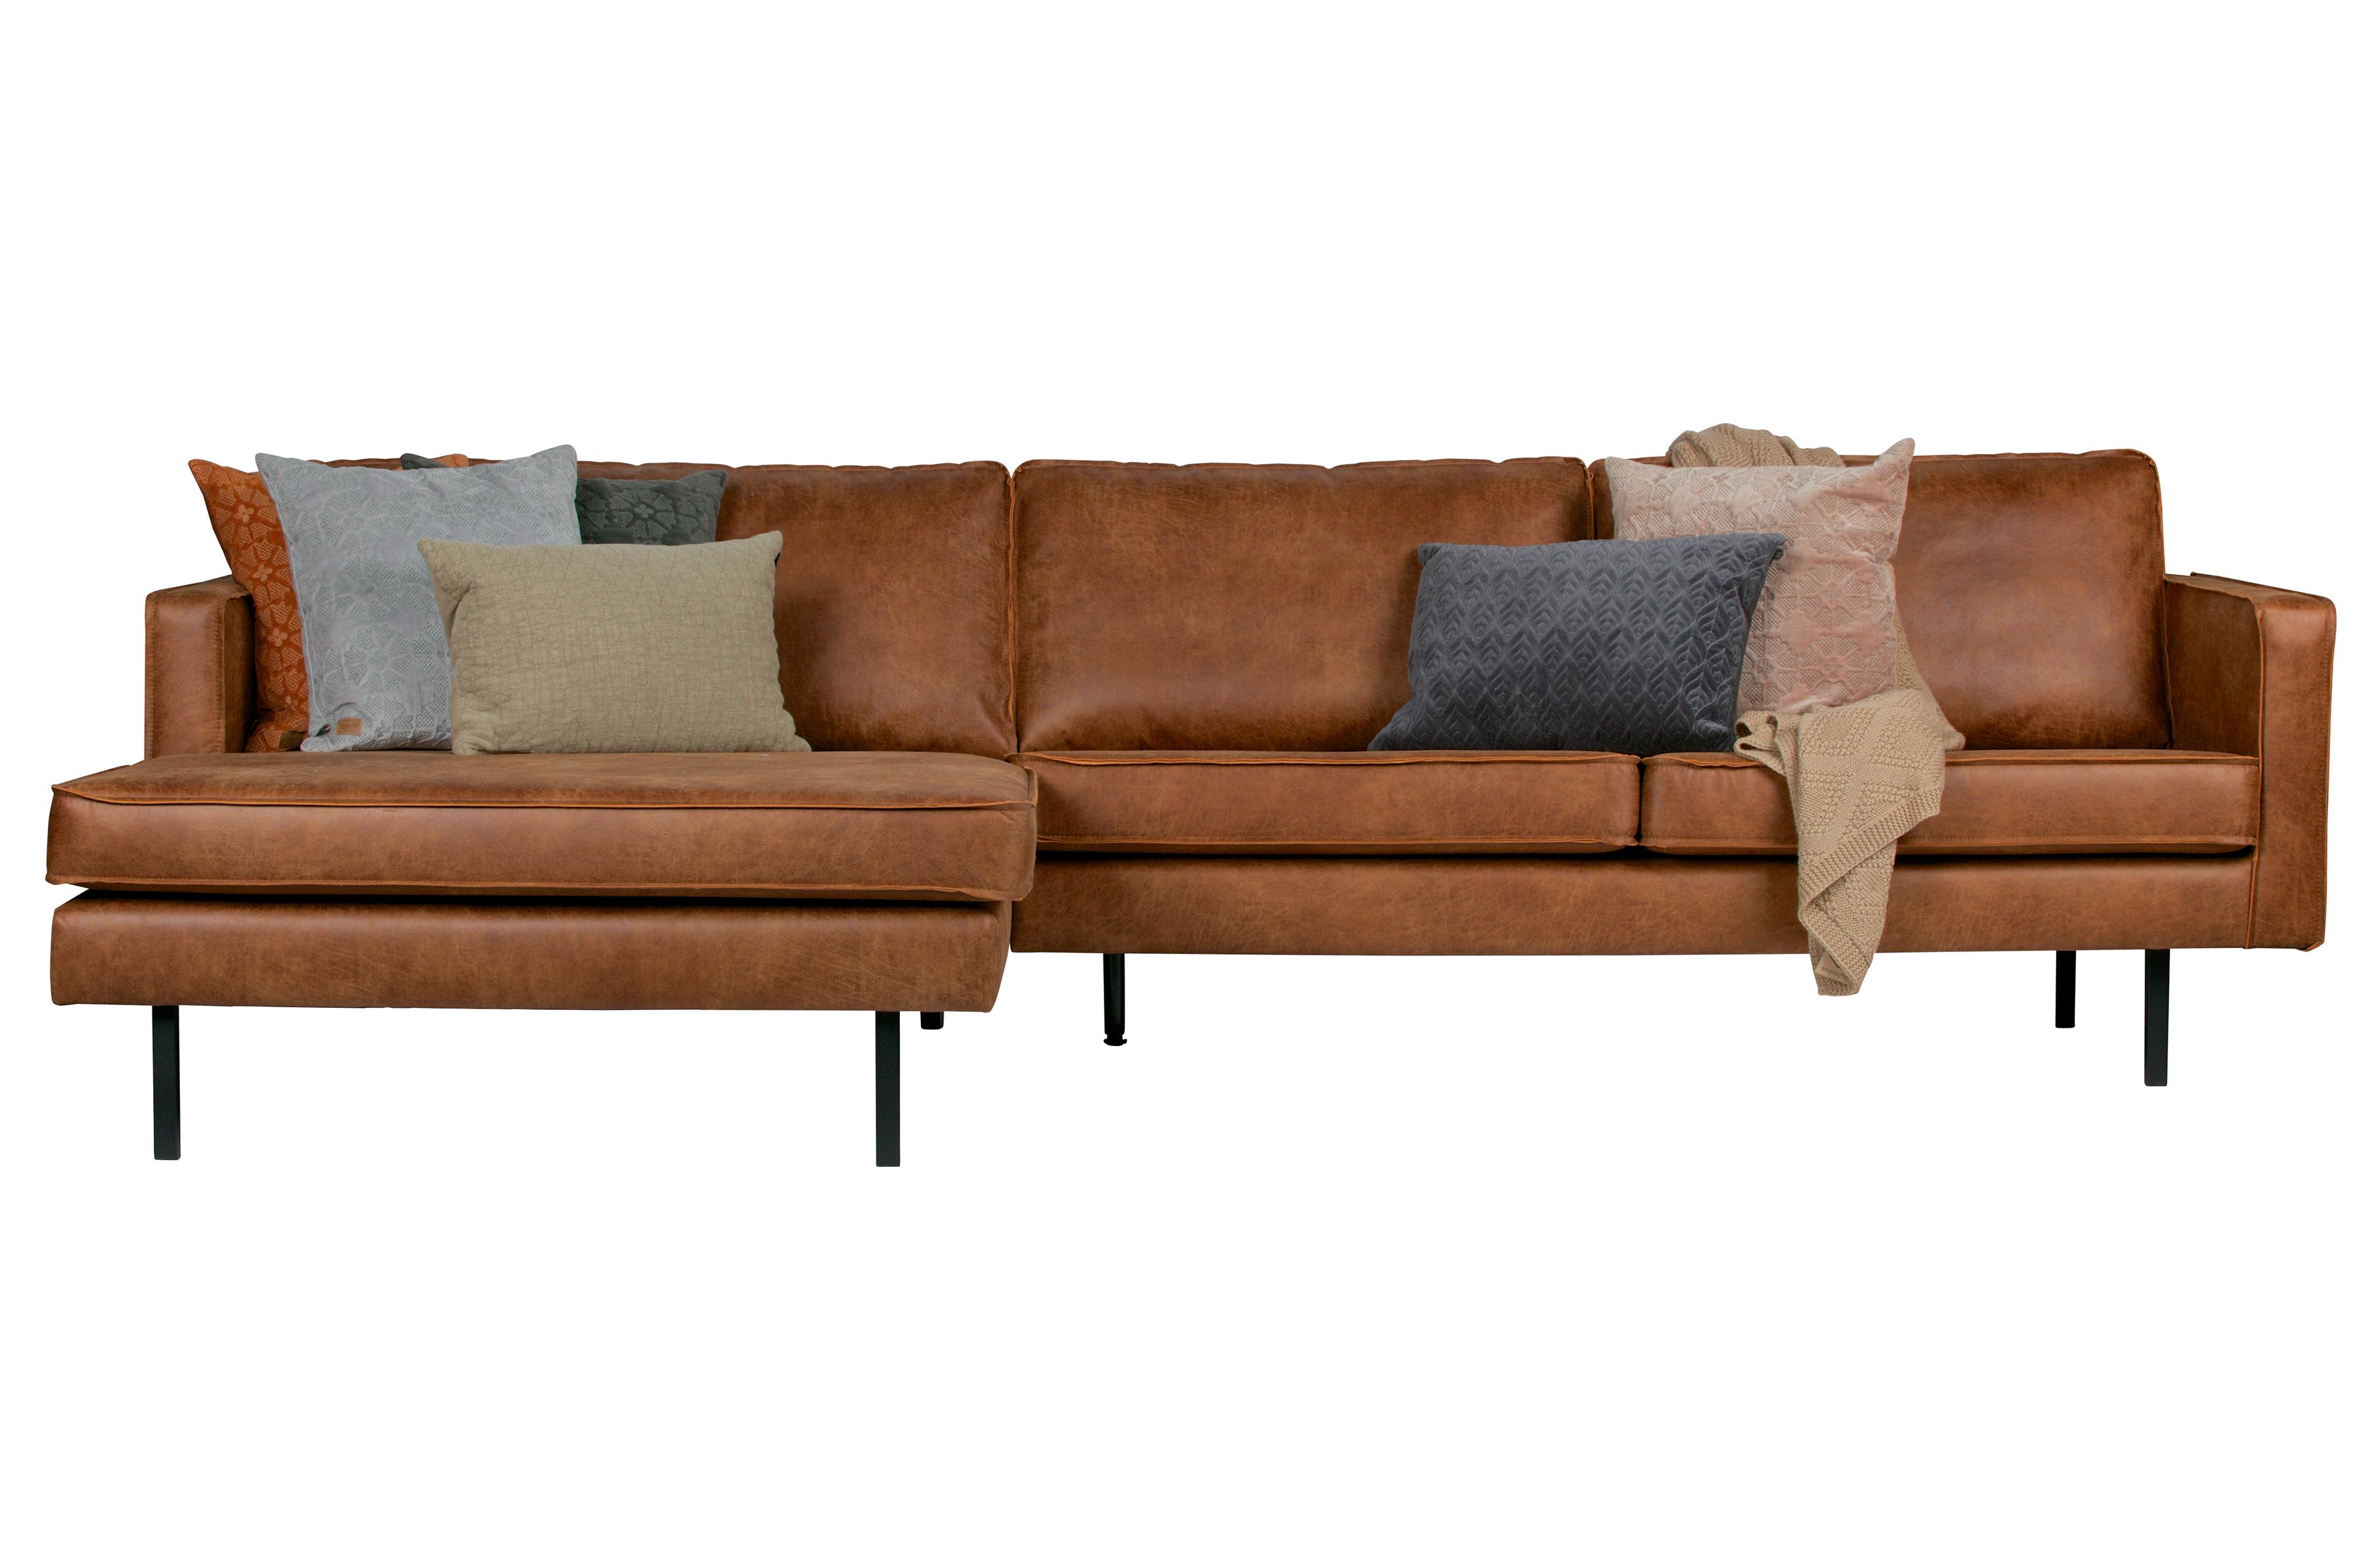 Eckgarnitur Rodeo Leder Cognac Couch Sofa Ecksofa Ledercouch